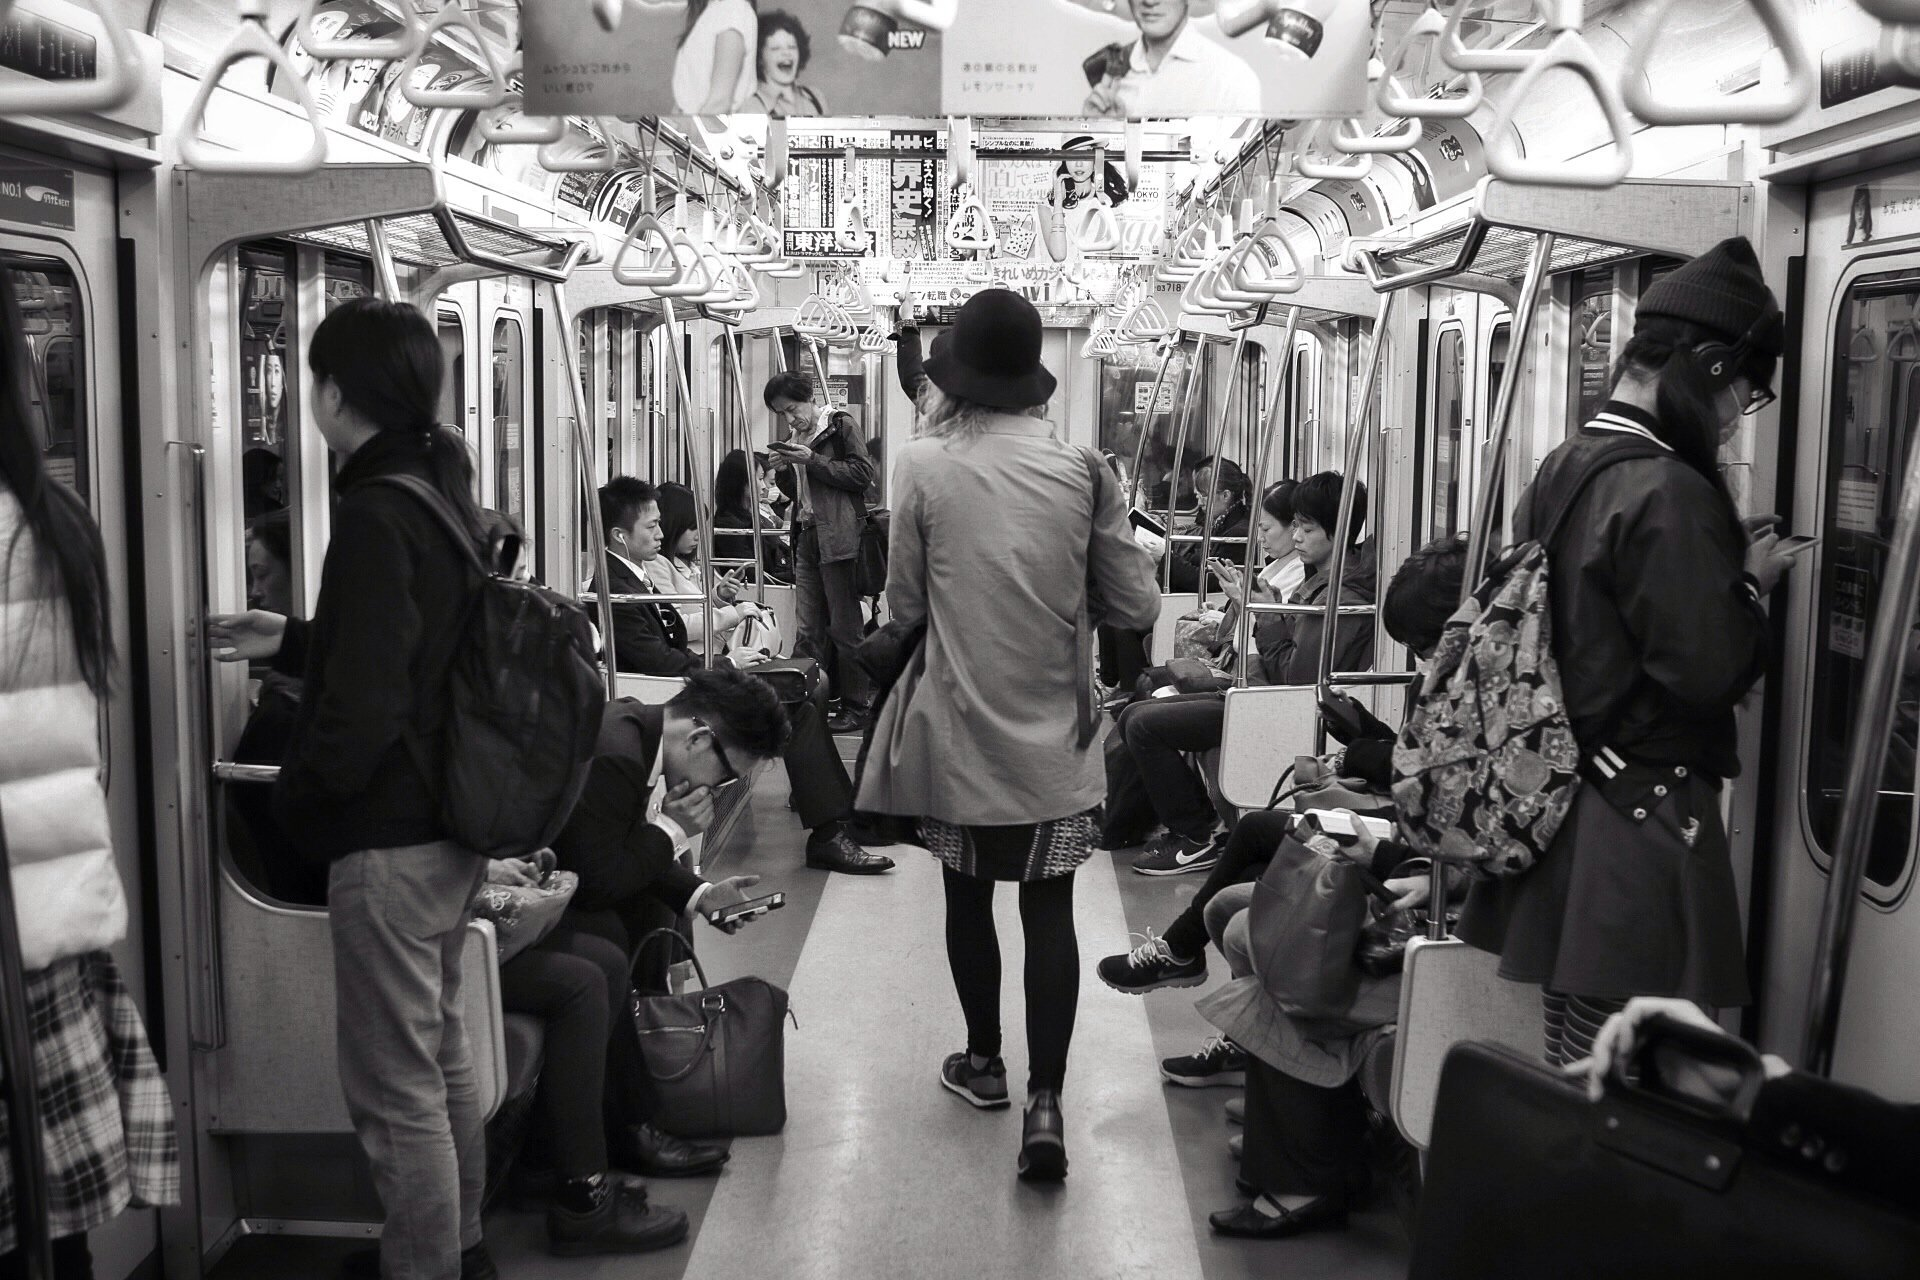 cecilia-tokyo-subway-kasuma-photo-blog